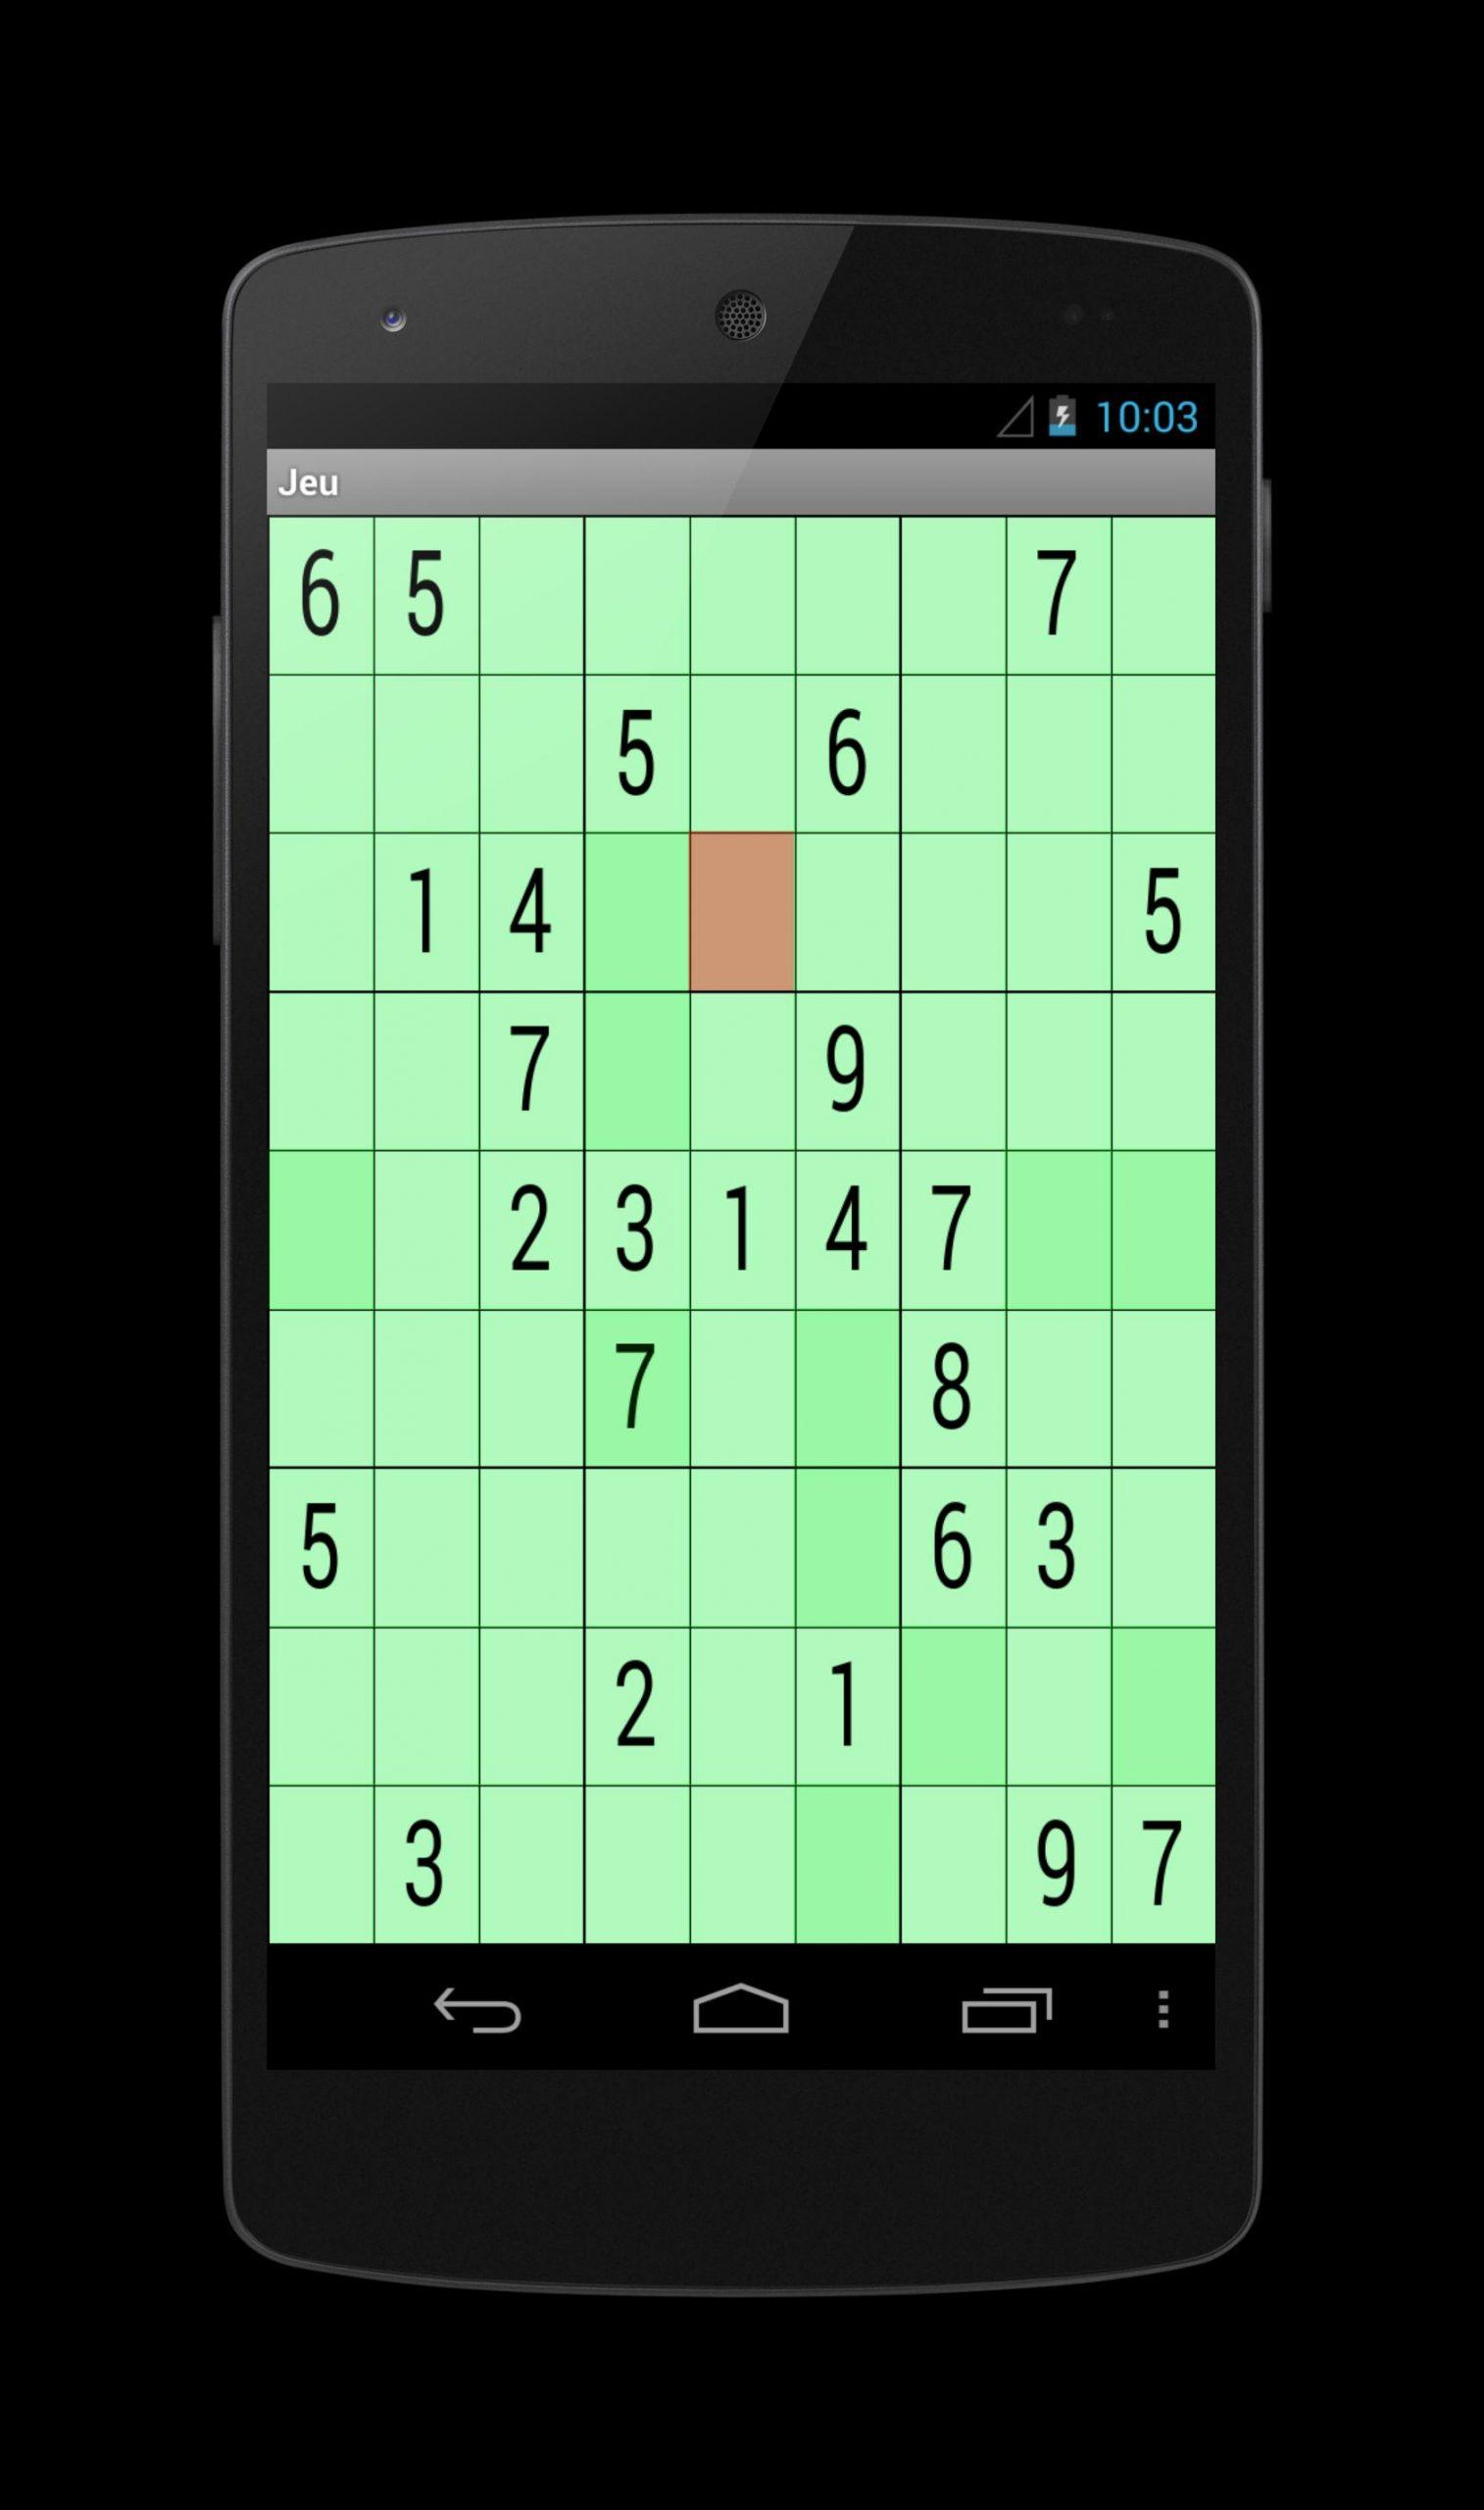 Android Için Sudoku 9X9 - Apk'yı İndir destiné Jeu Le Sudoku